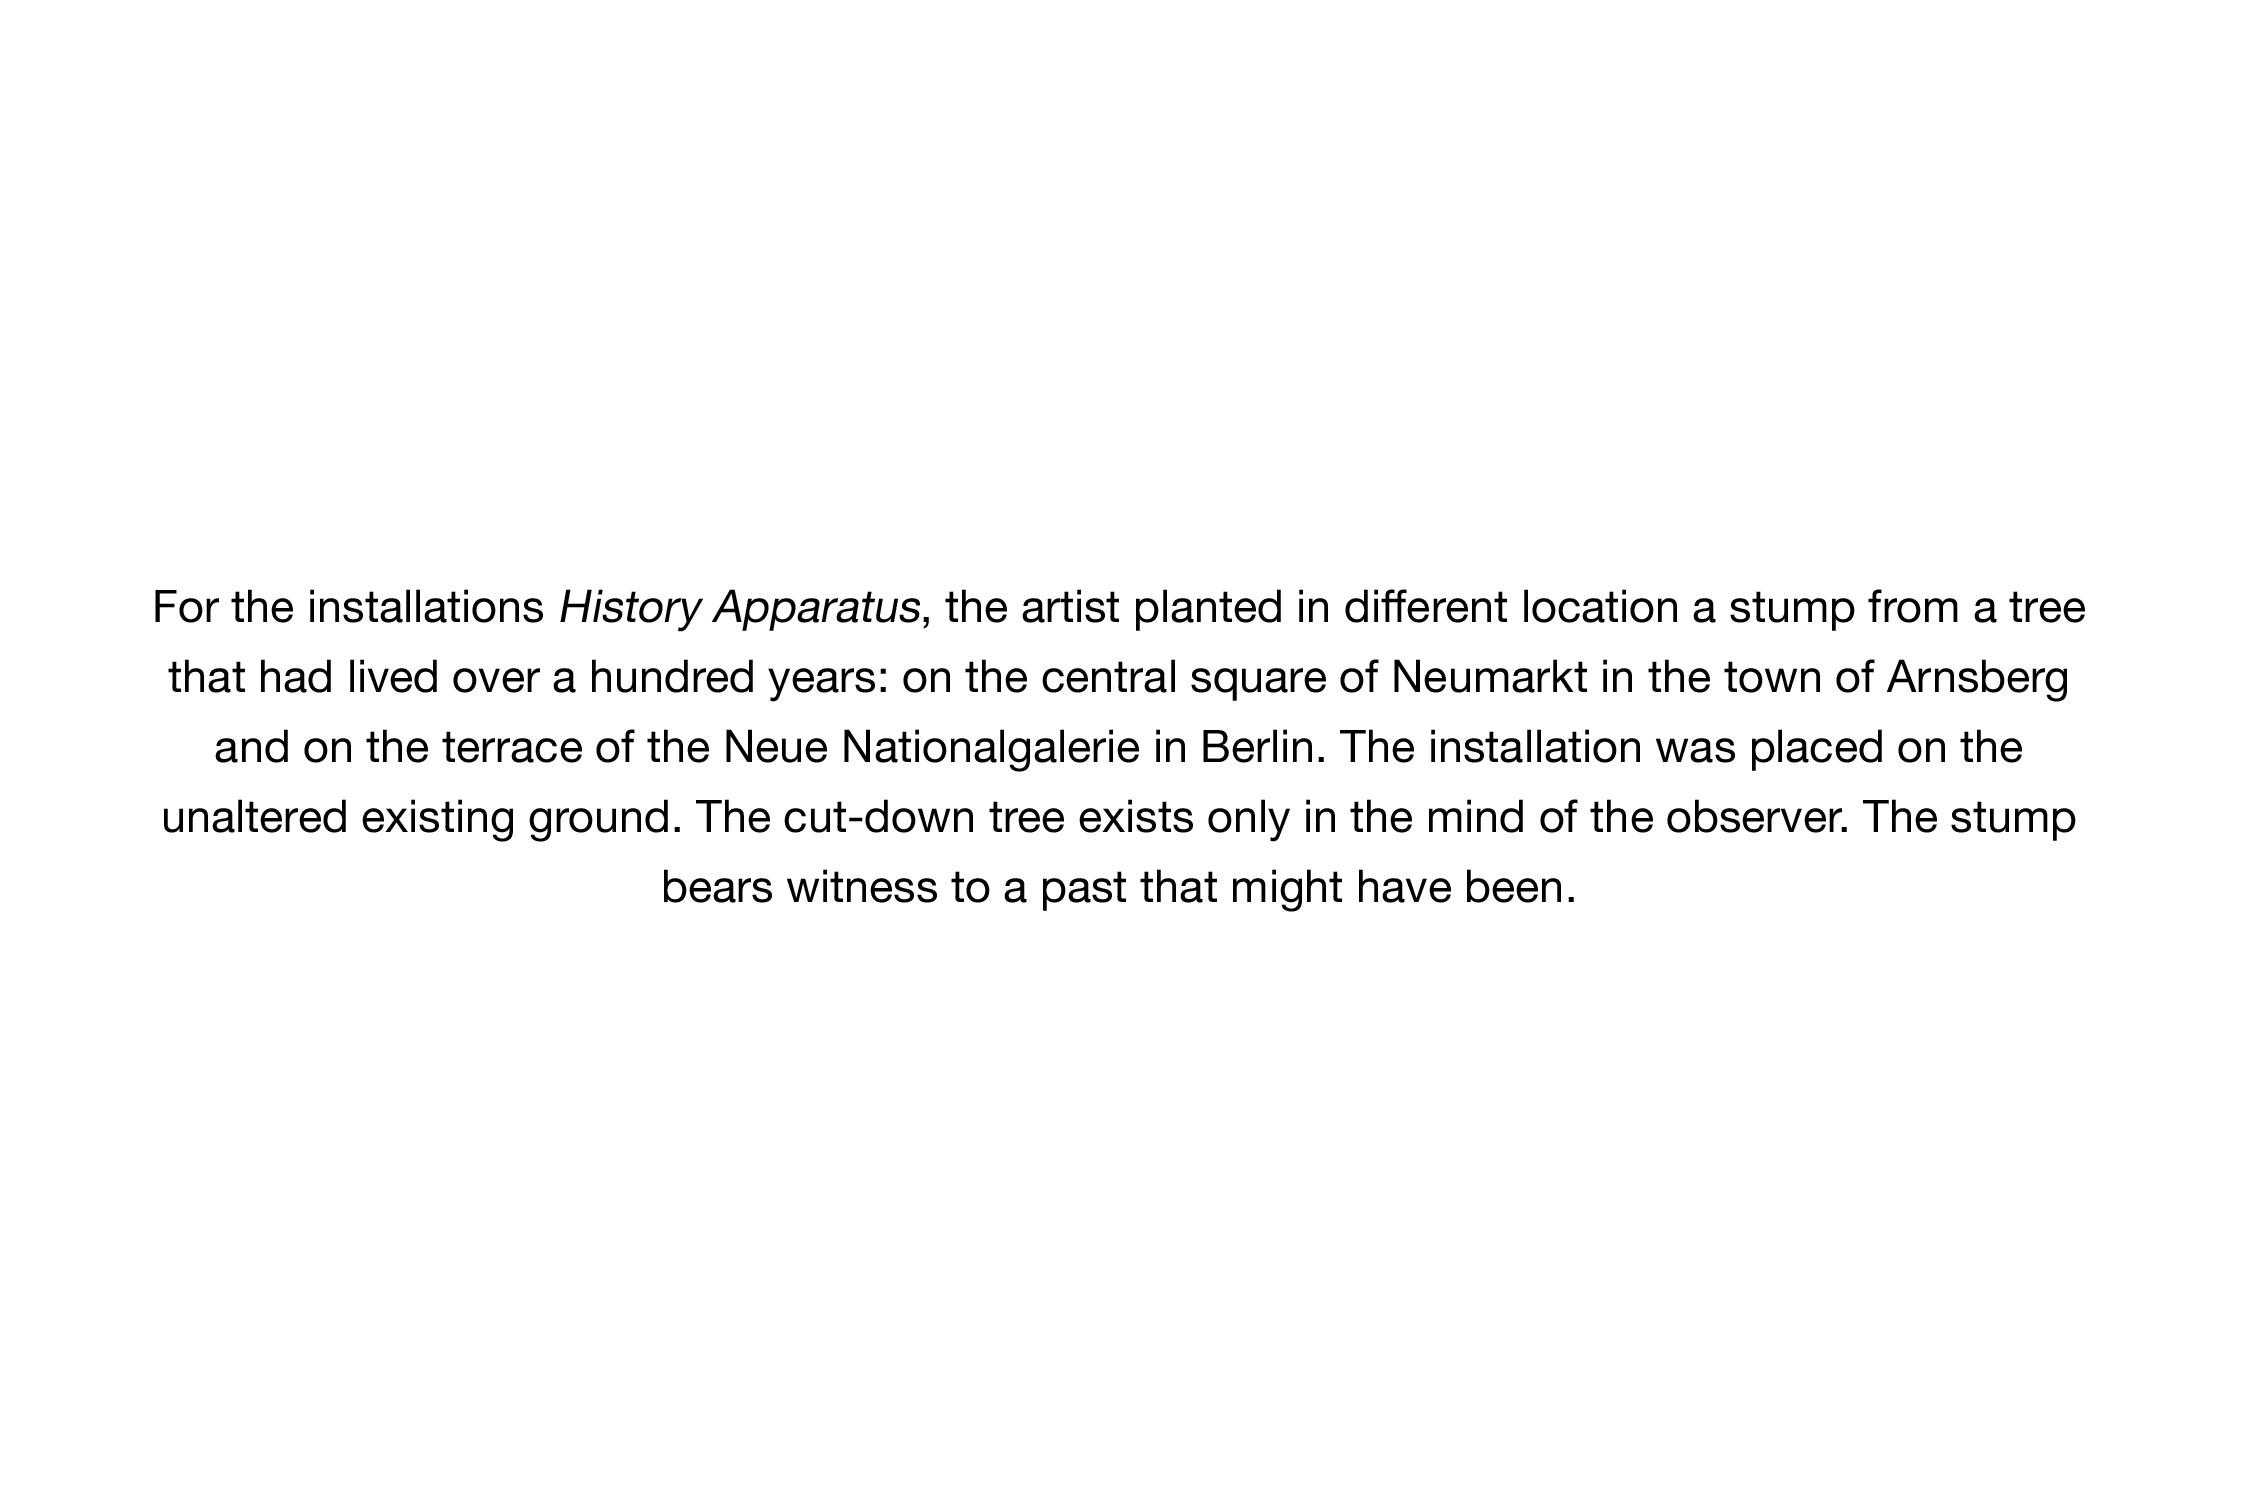 History Apparatus